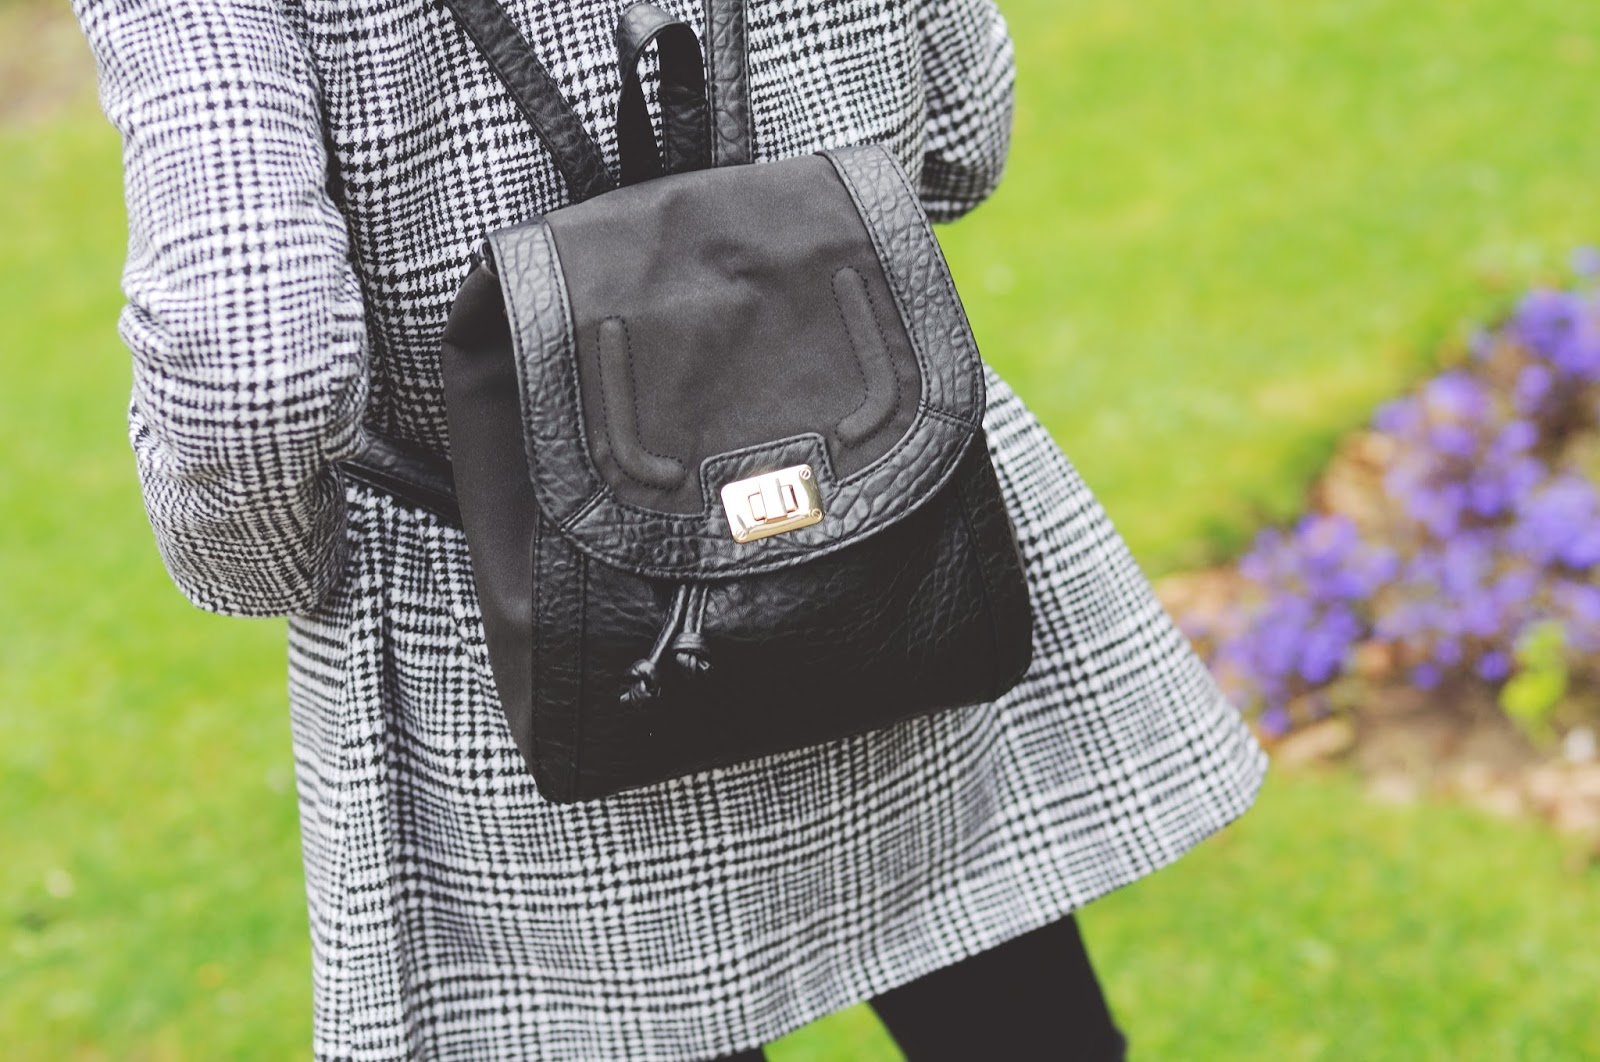 90s style rucksack, black rucksack